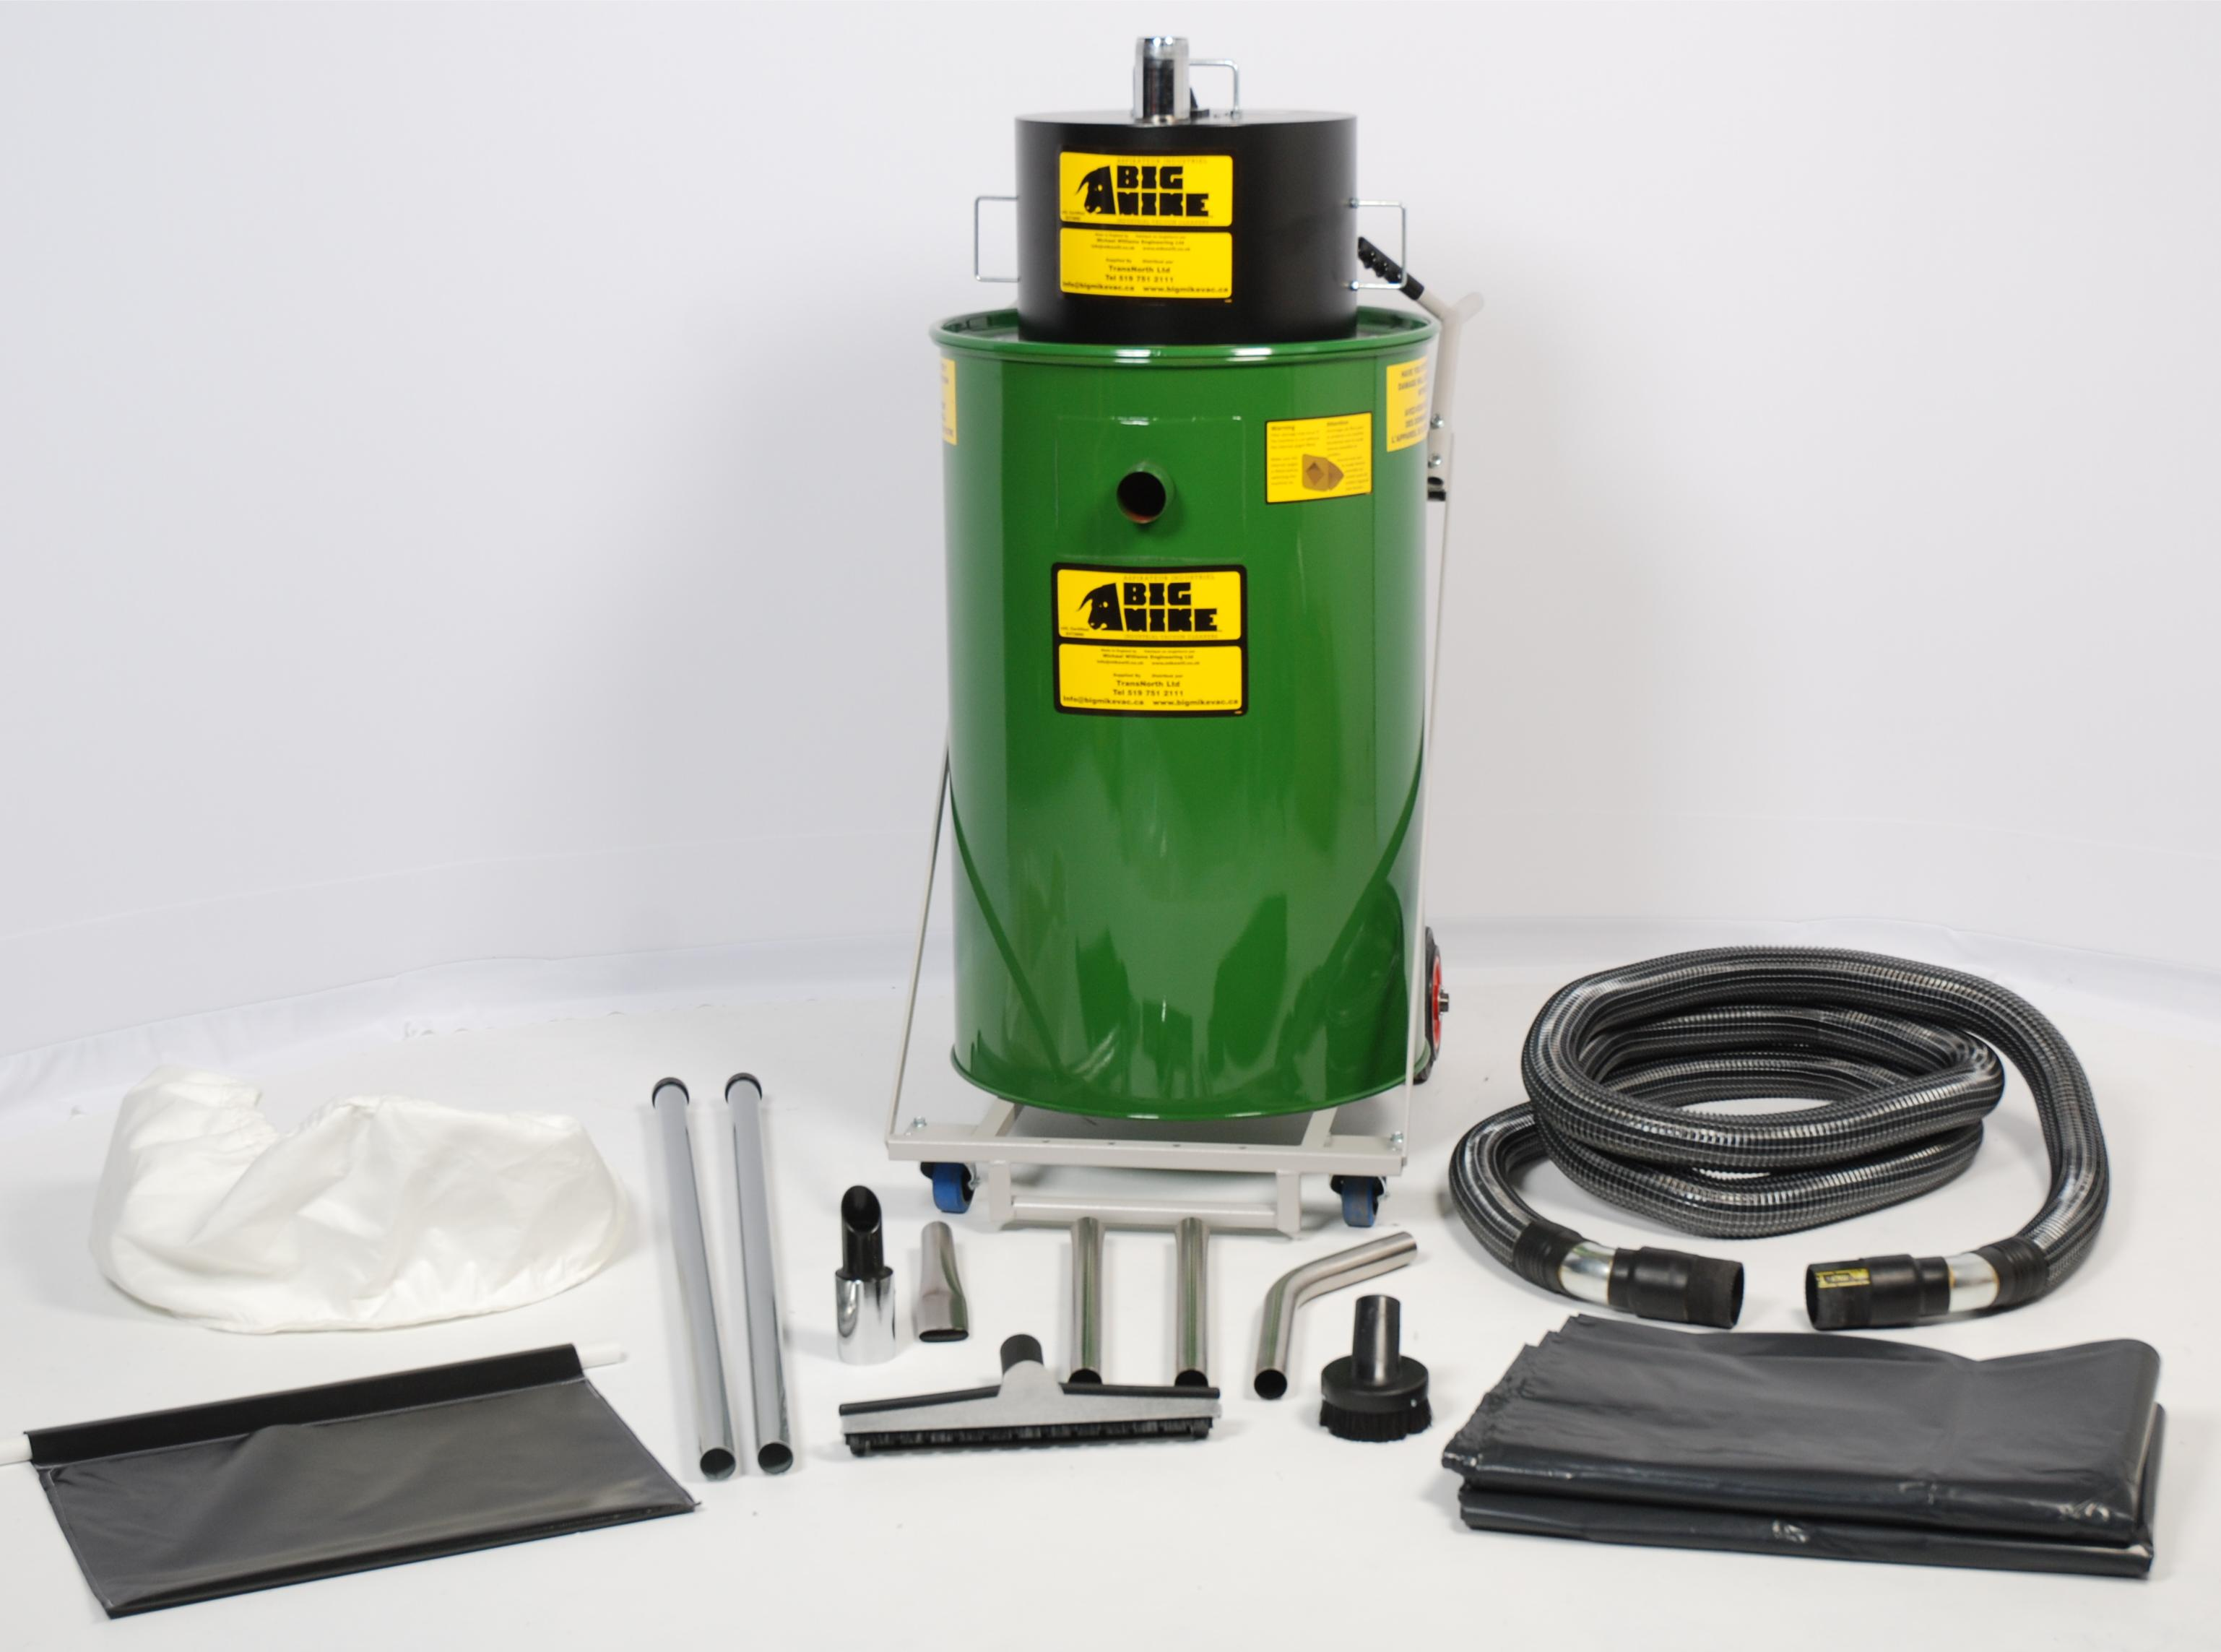 S&B Vacuum with Accessories